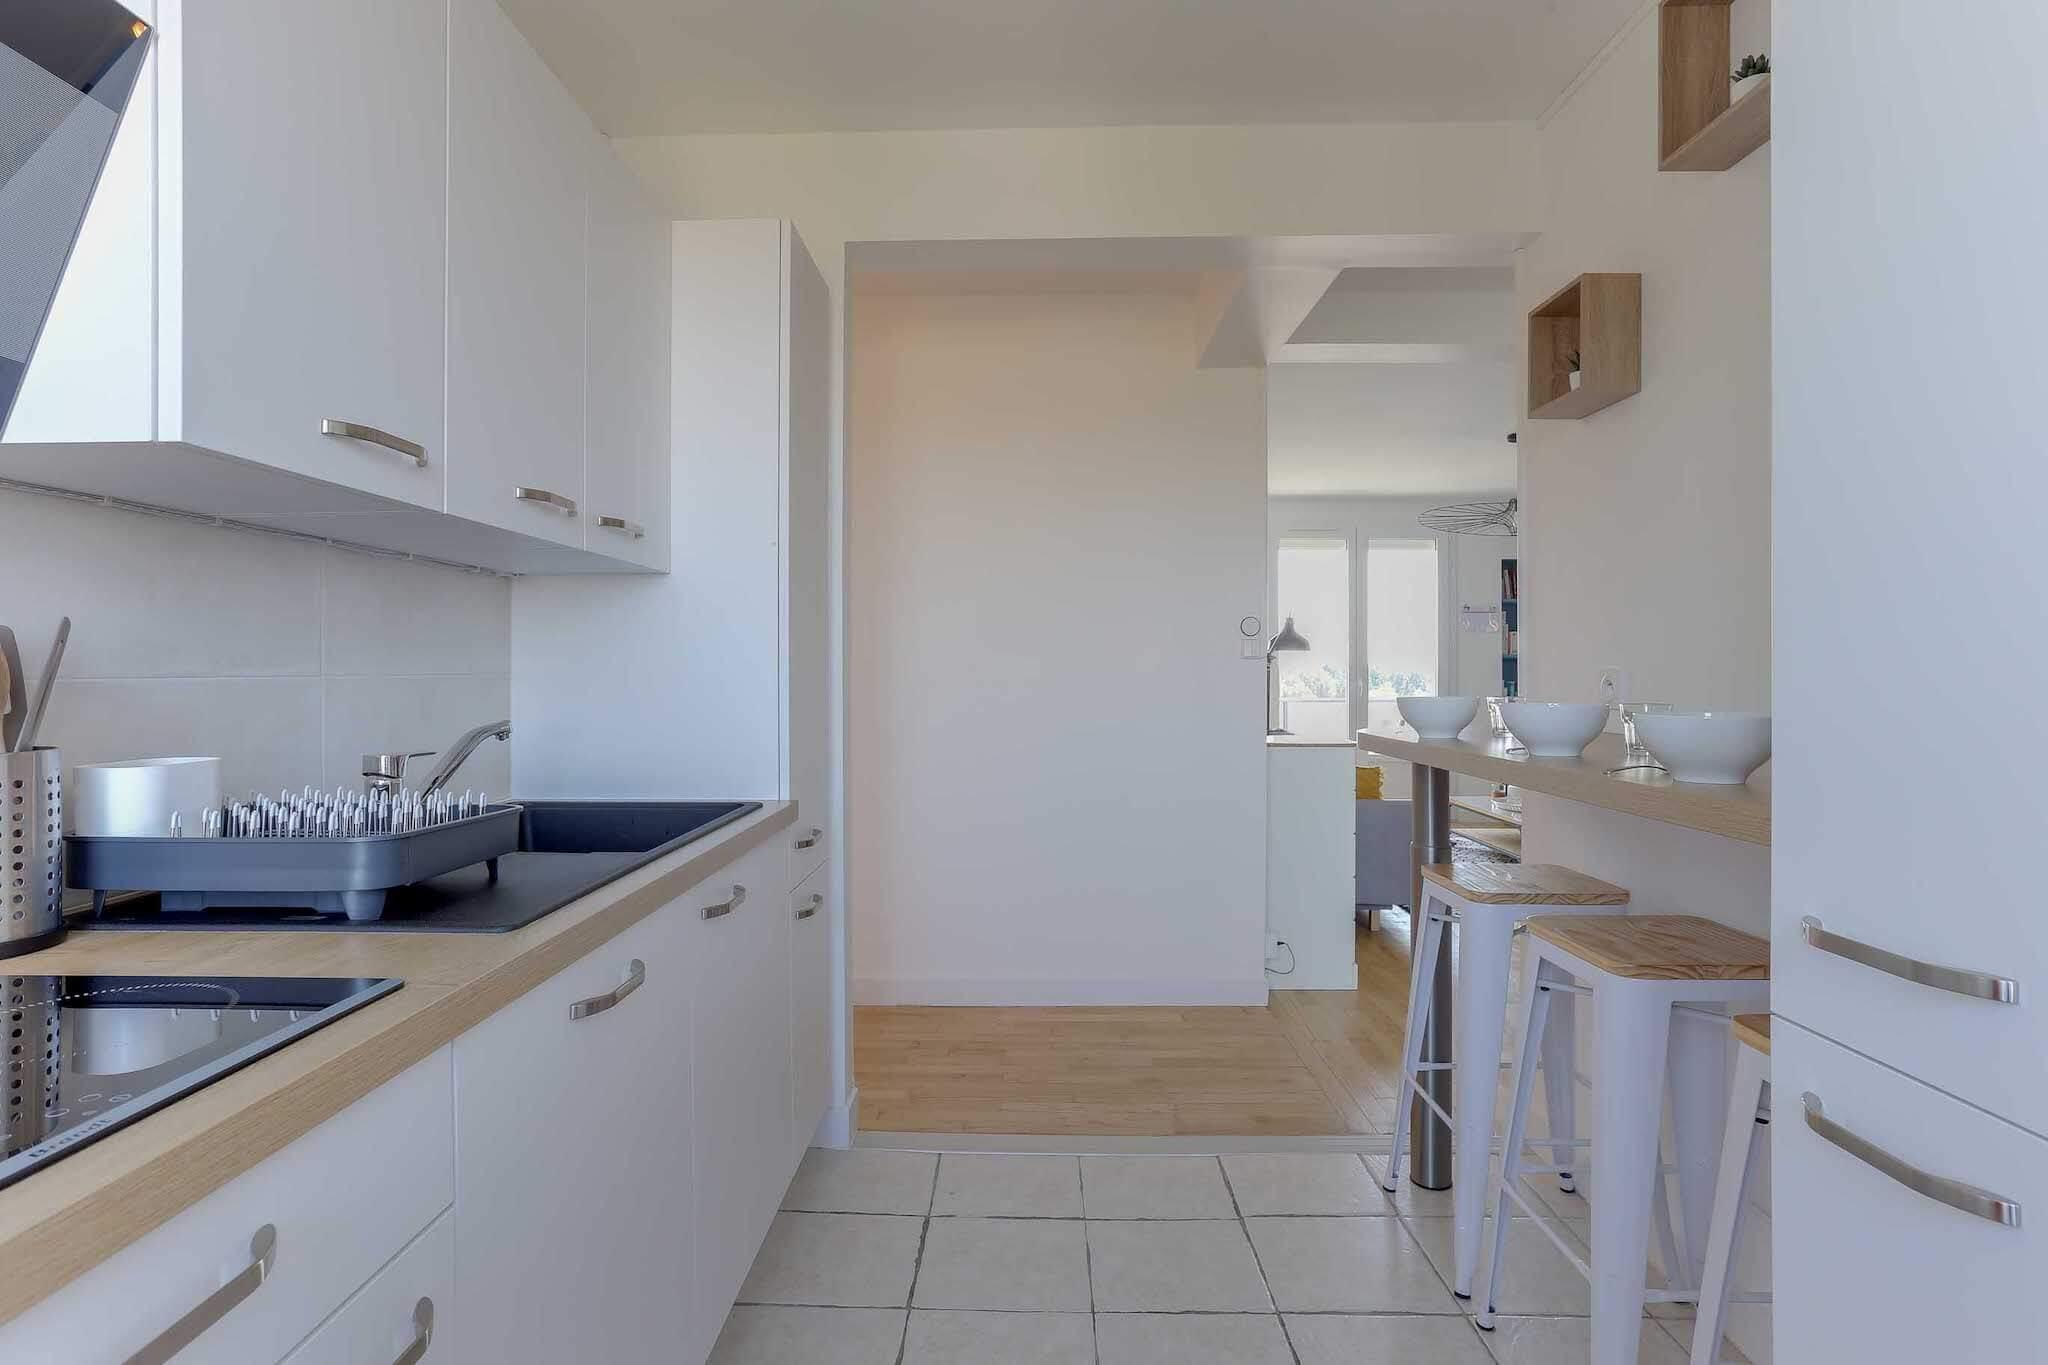 grande-cuisine-lumineuse-location-colocation-appartement-meublé-rennes